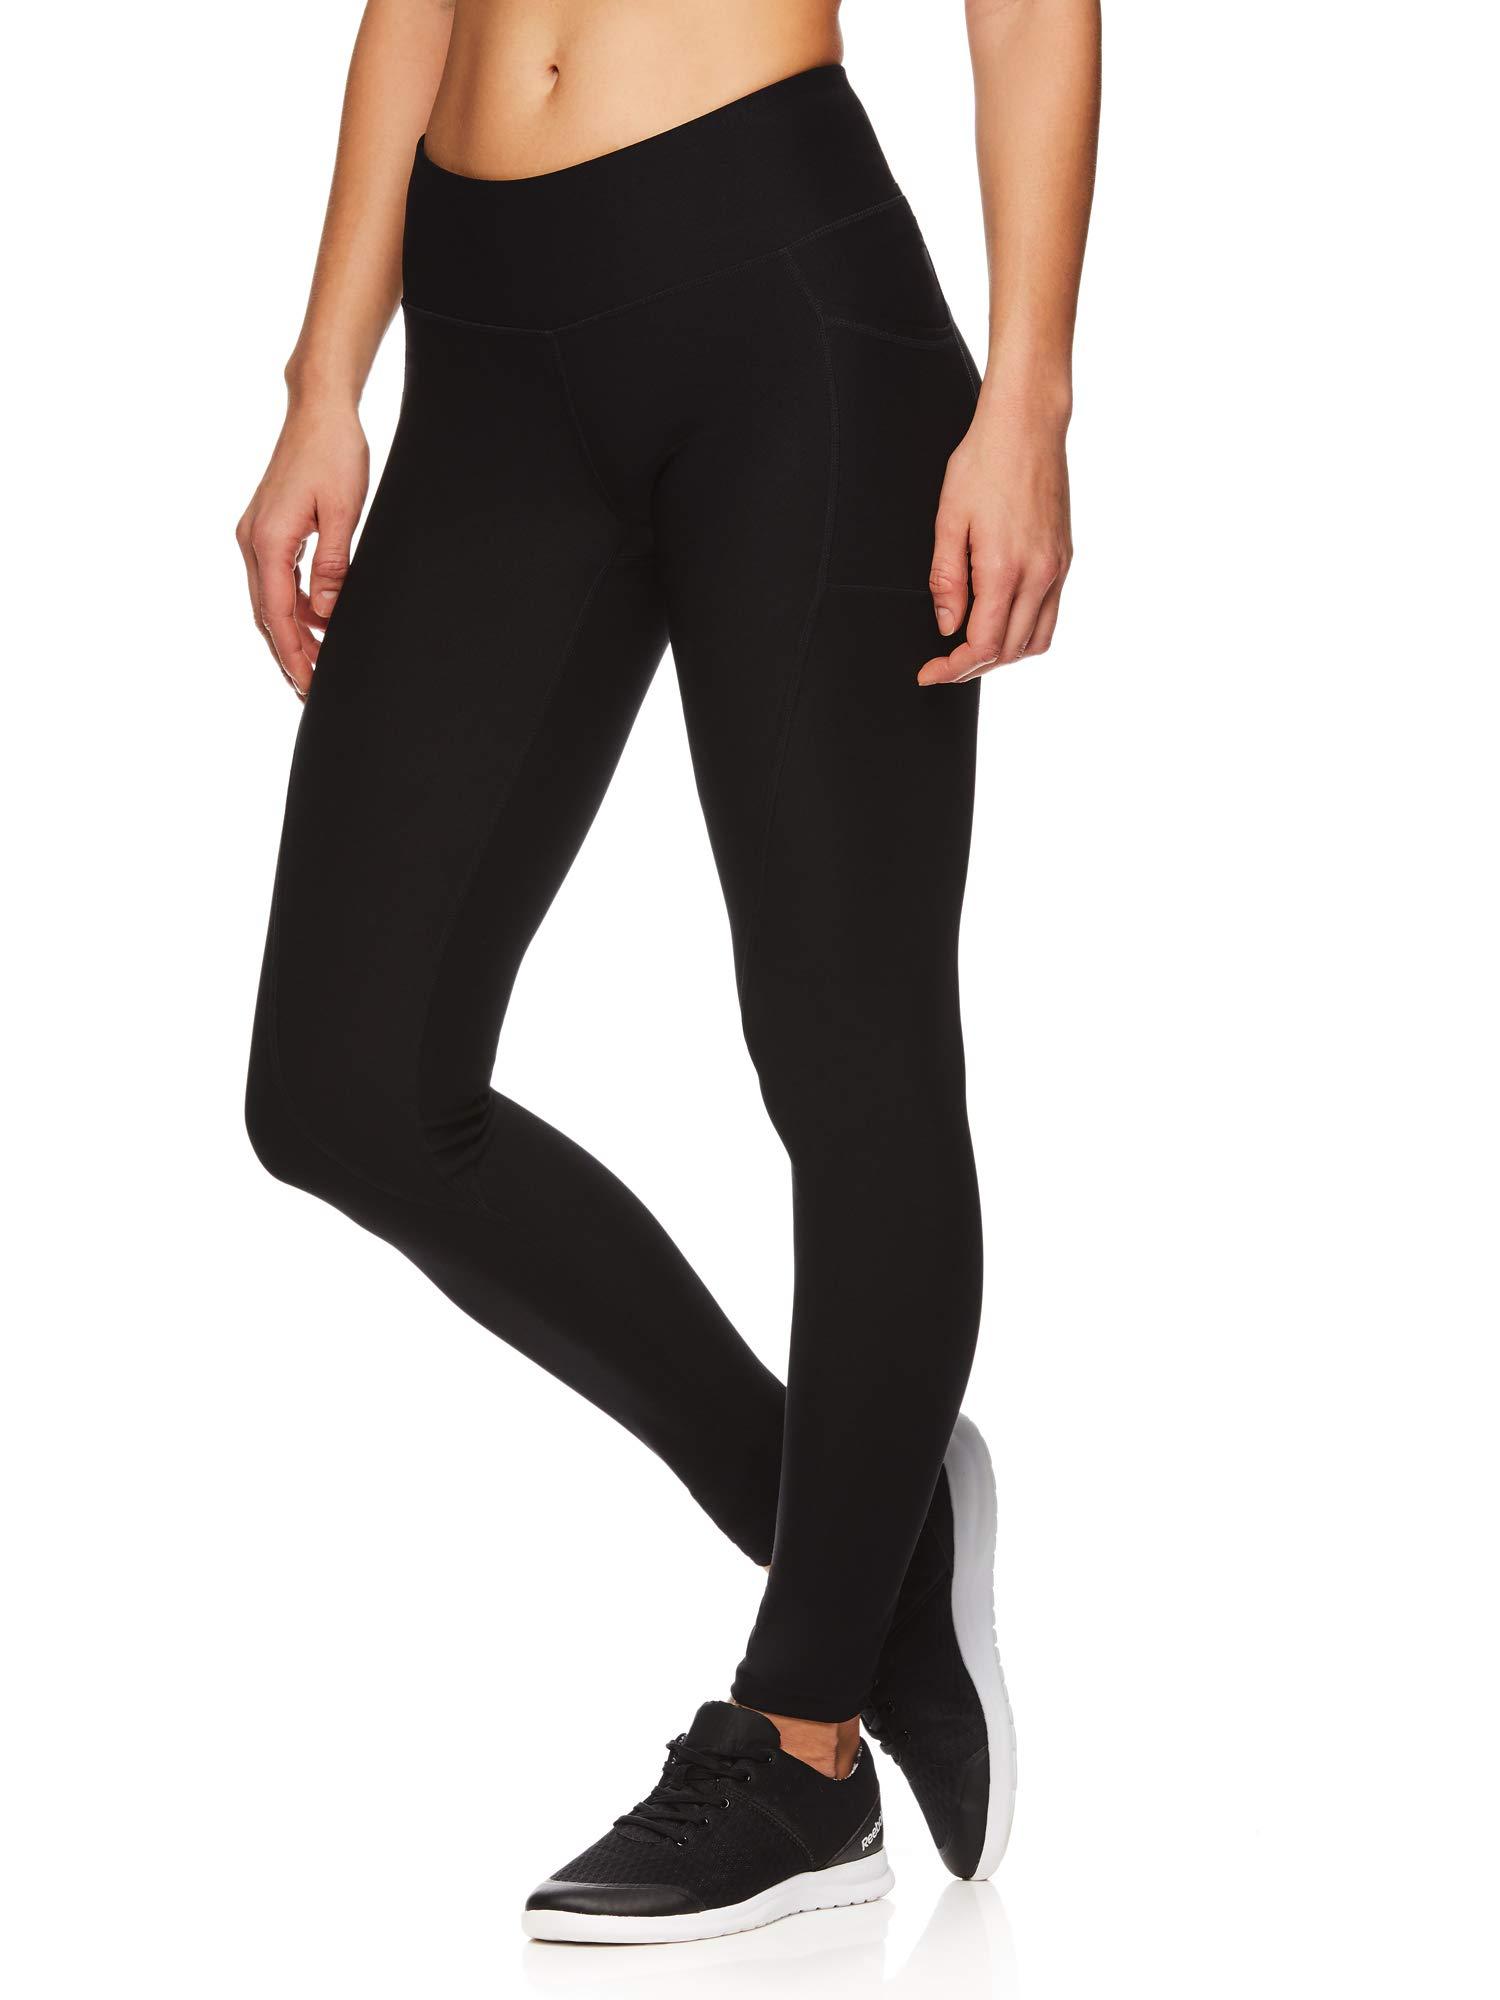 Reebok Women's Legging Full Length Performance Compression Pants - Black Dark, X-Small by Reebok